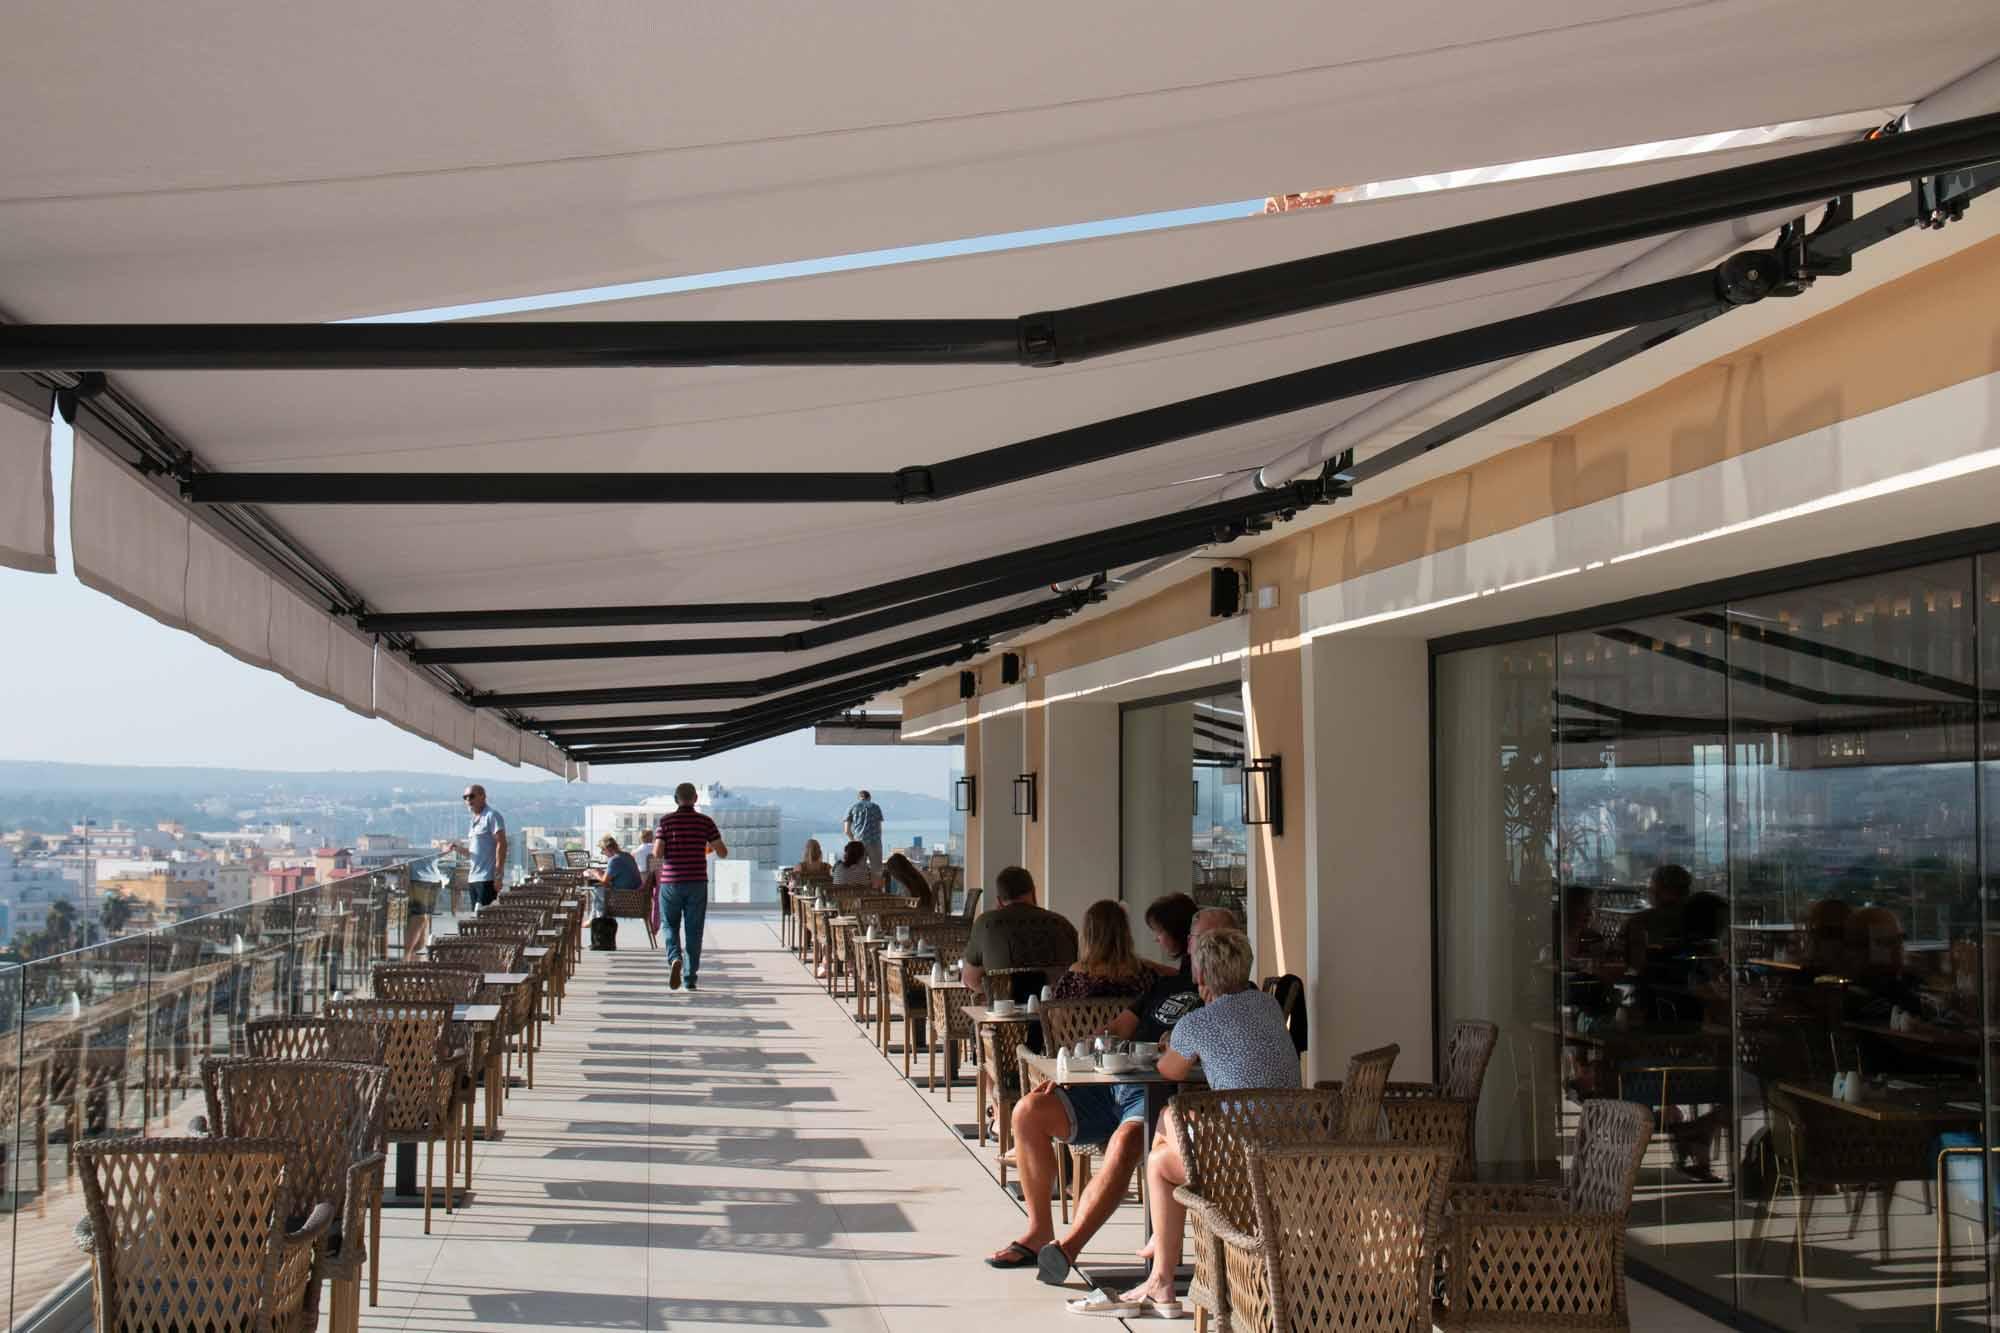 Grandiose Aussicht über Palma de Mallorca vom Restaurant des Grupotel Playa de Palma Prestige Suites & Spa. / Foto: Ingo Paszkowsky